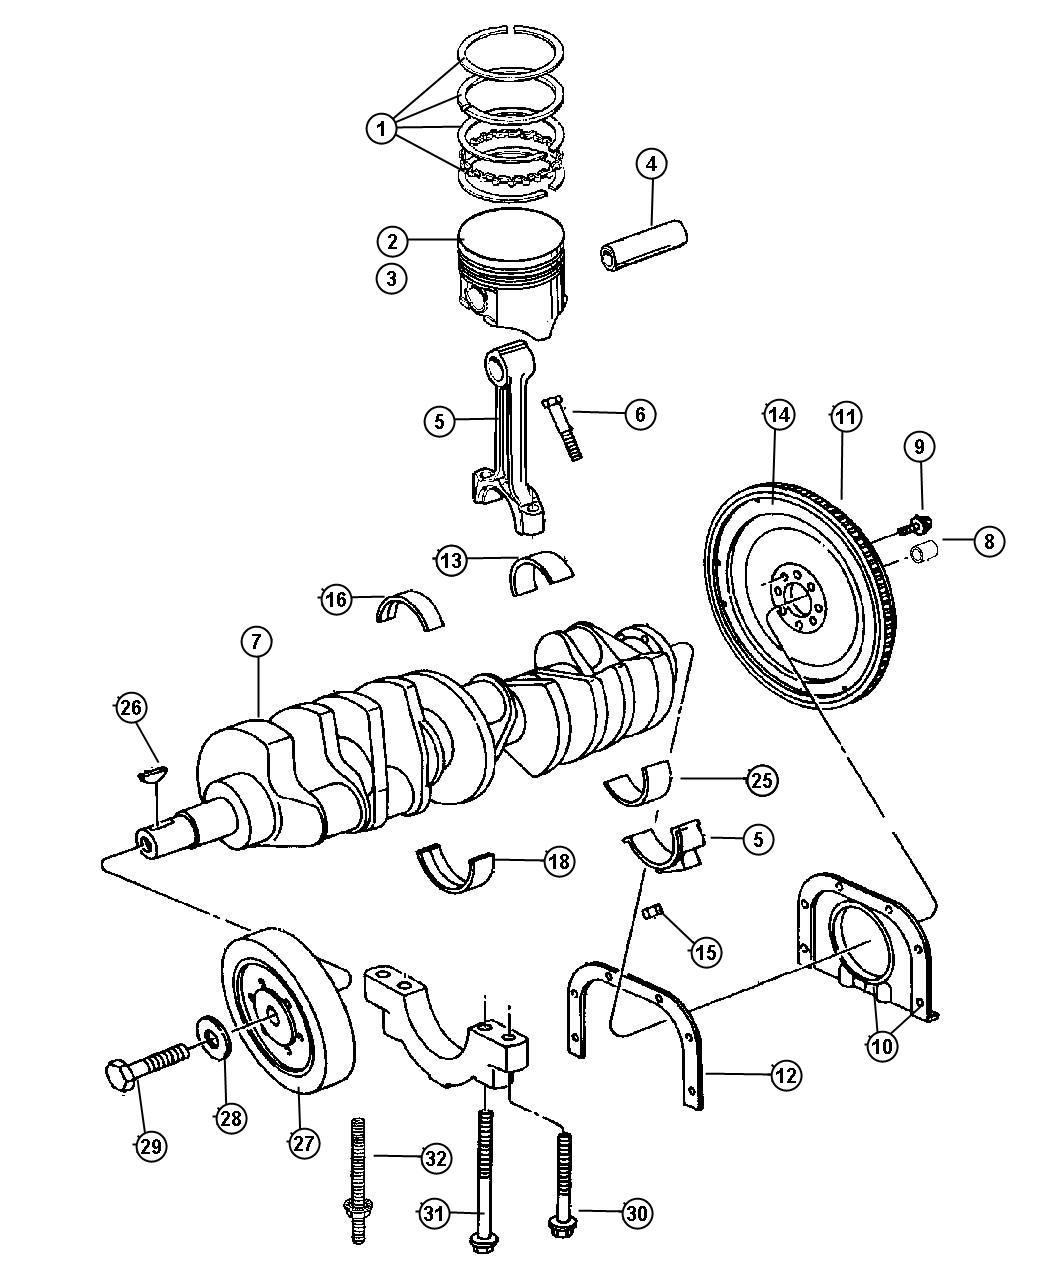 1998 Dodge Viper Bearing package. Crankshaft. 010 u/s. [#1